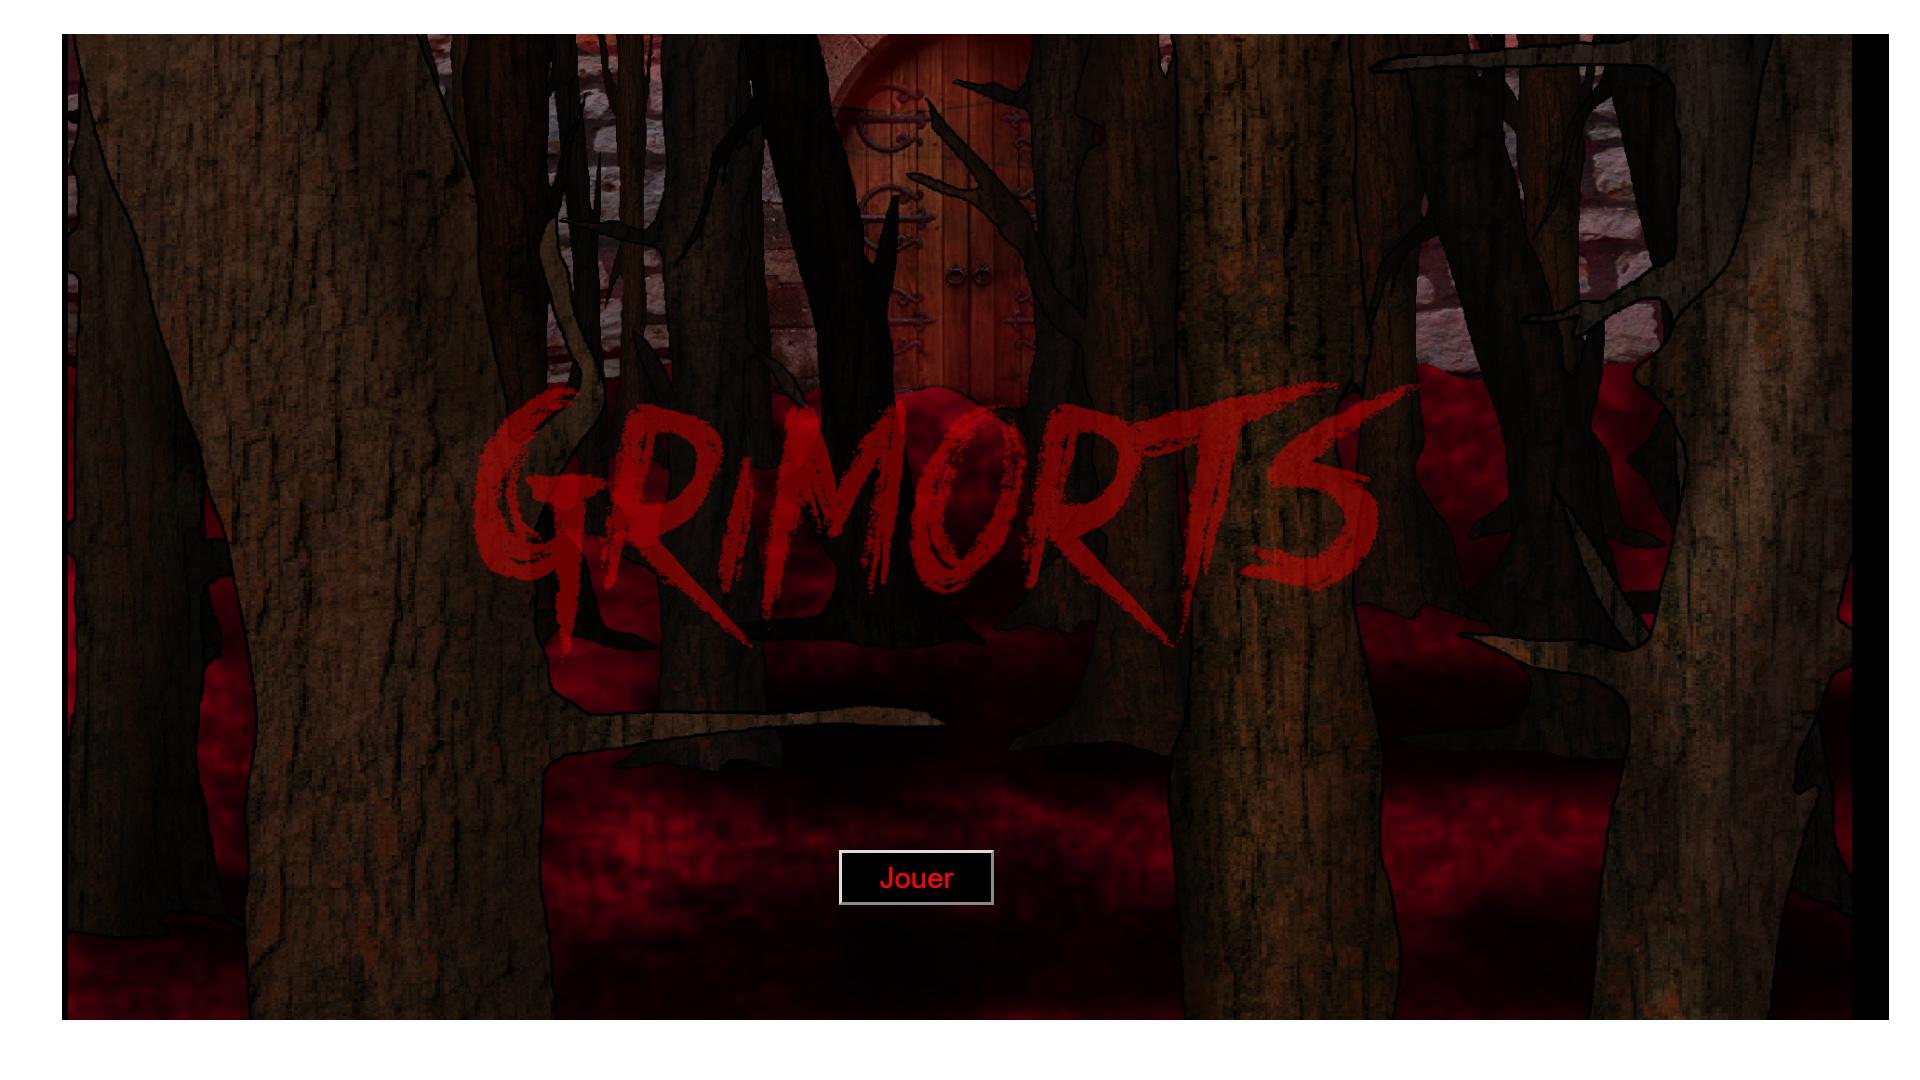 Grimort01